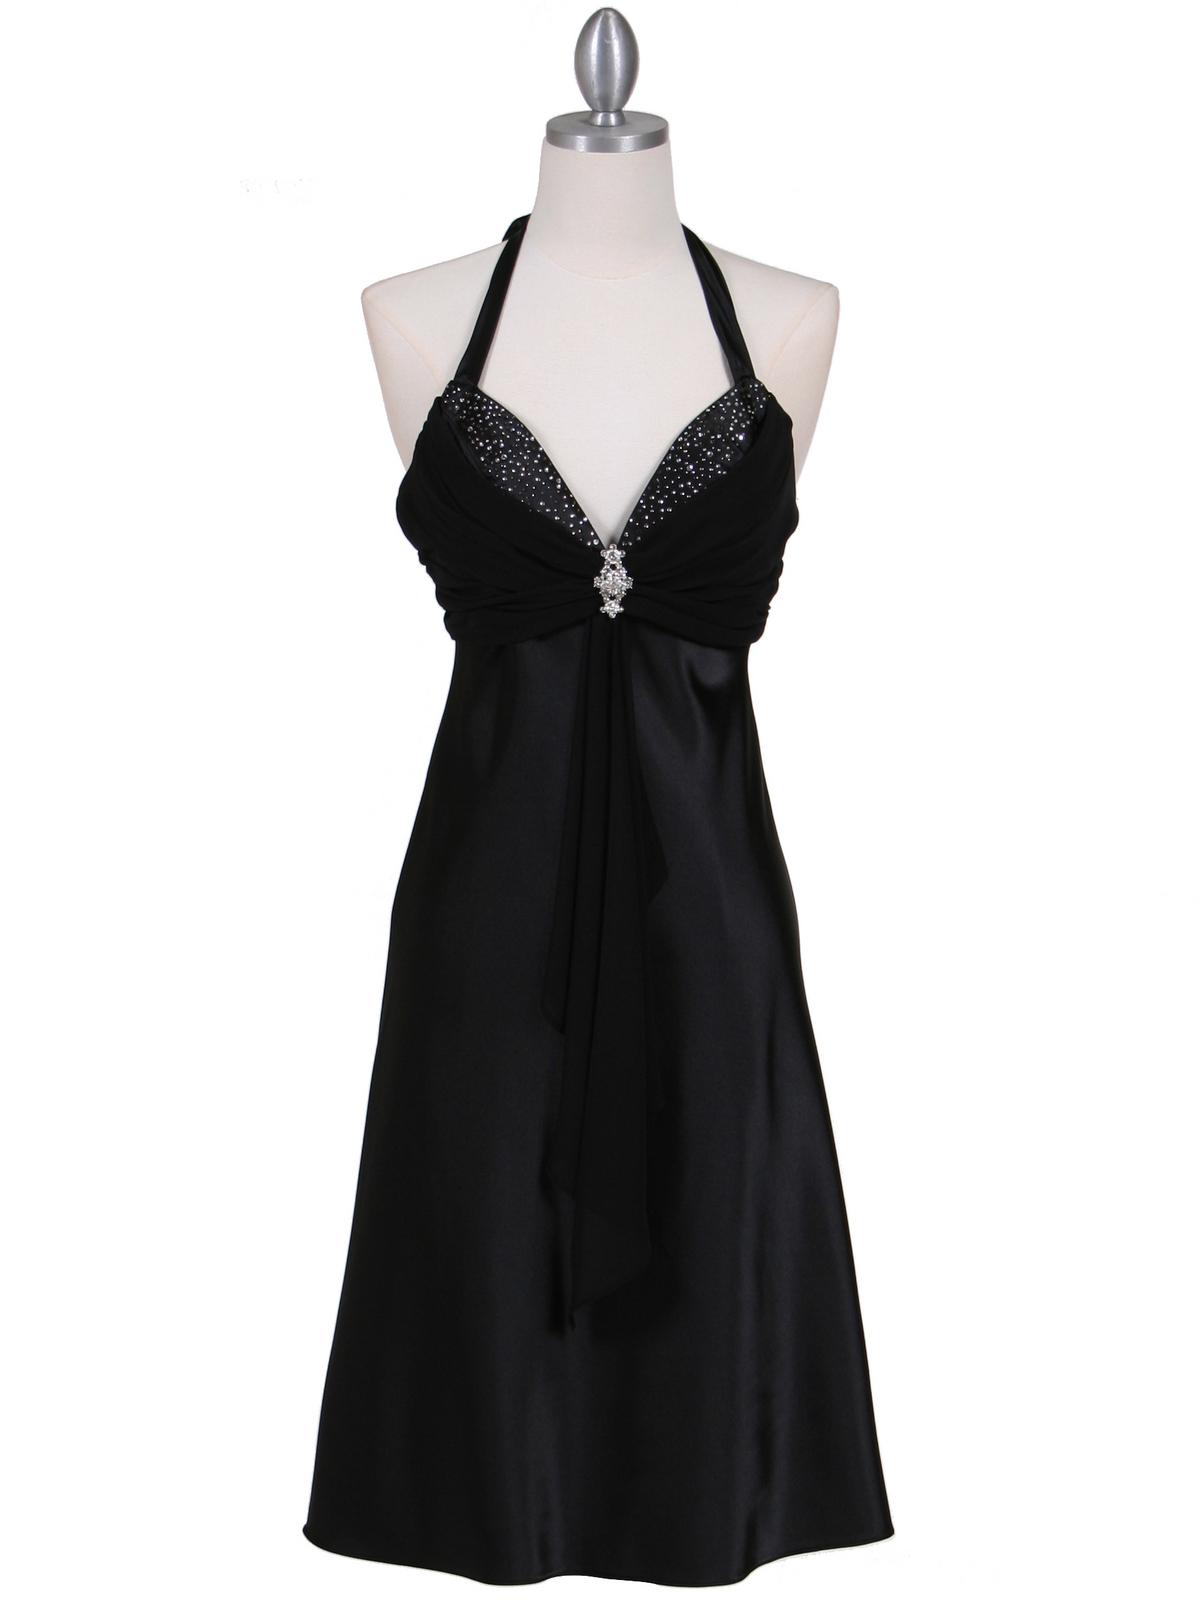 Black Halter Cocktail Dress With Rhinestone Pin Sung